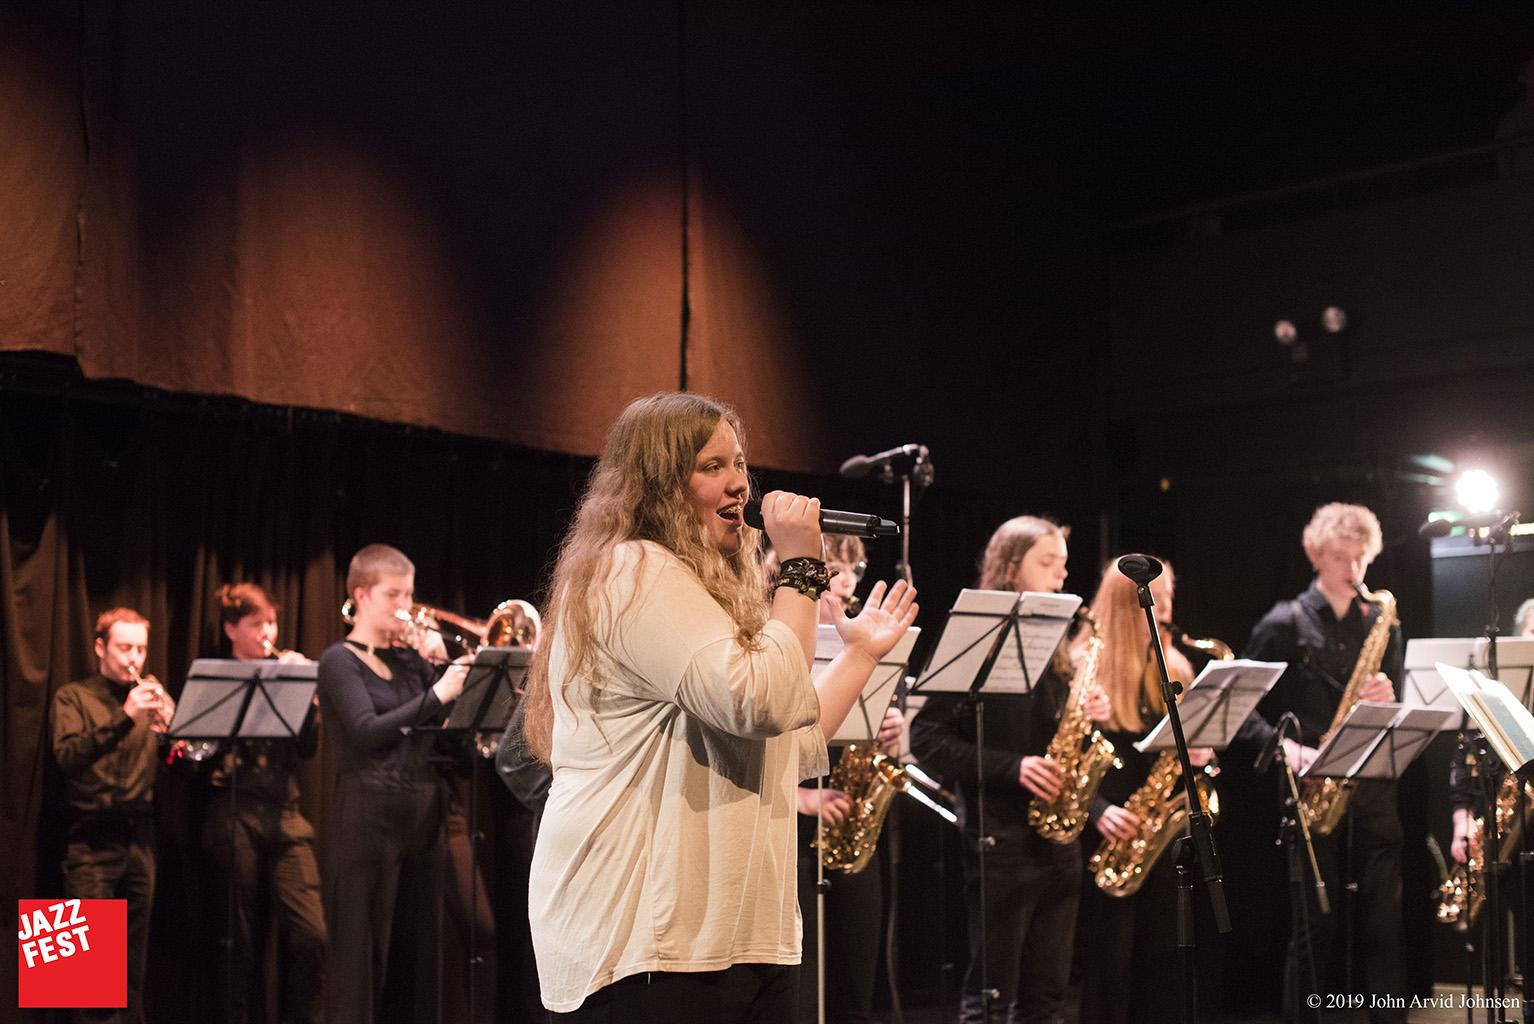 190511 Jazzfest Ung @ Isak Kultursenter (foto John Arvid Johnsen) _ 12.jpg